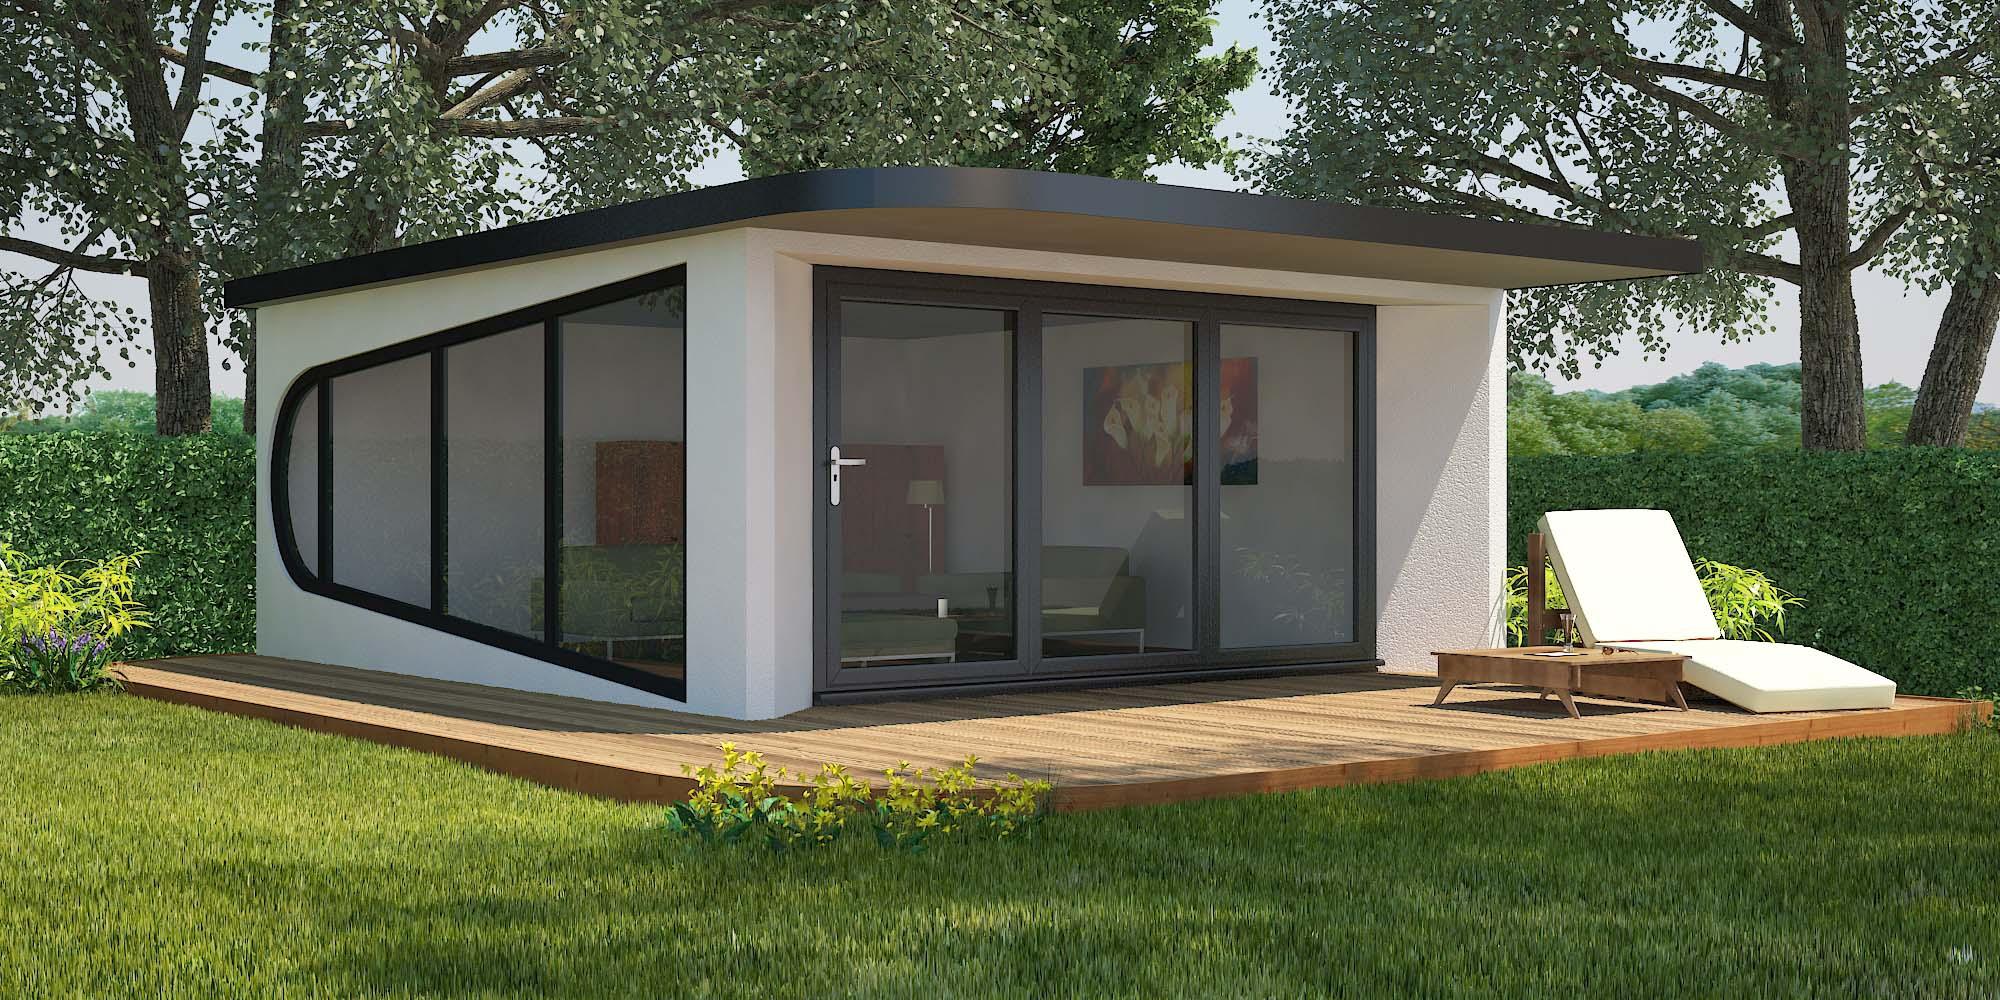 swift excited by new garden room designs swift garden rooms